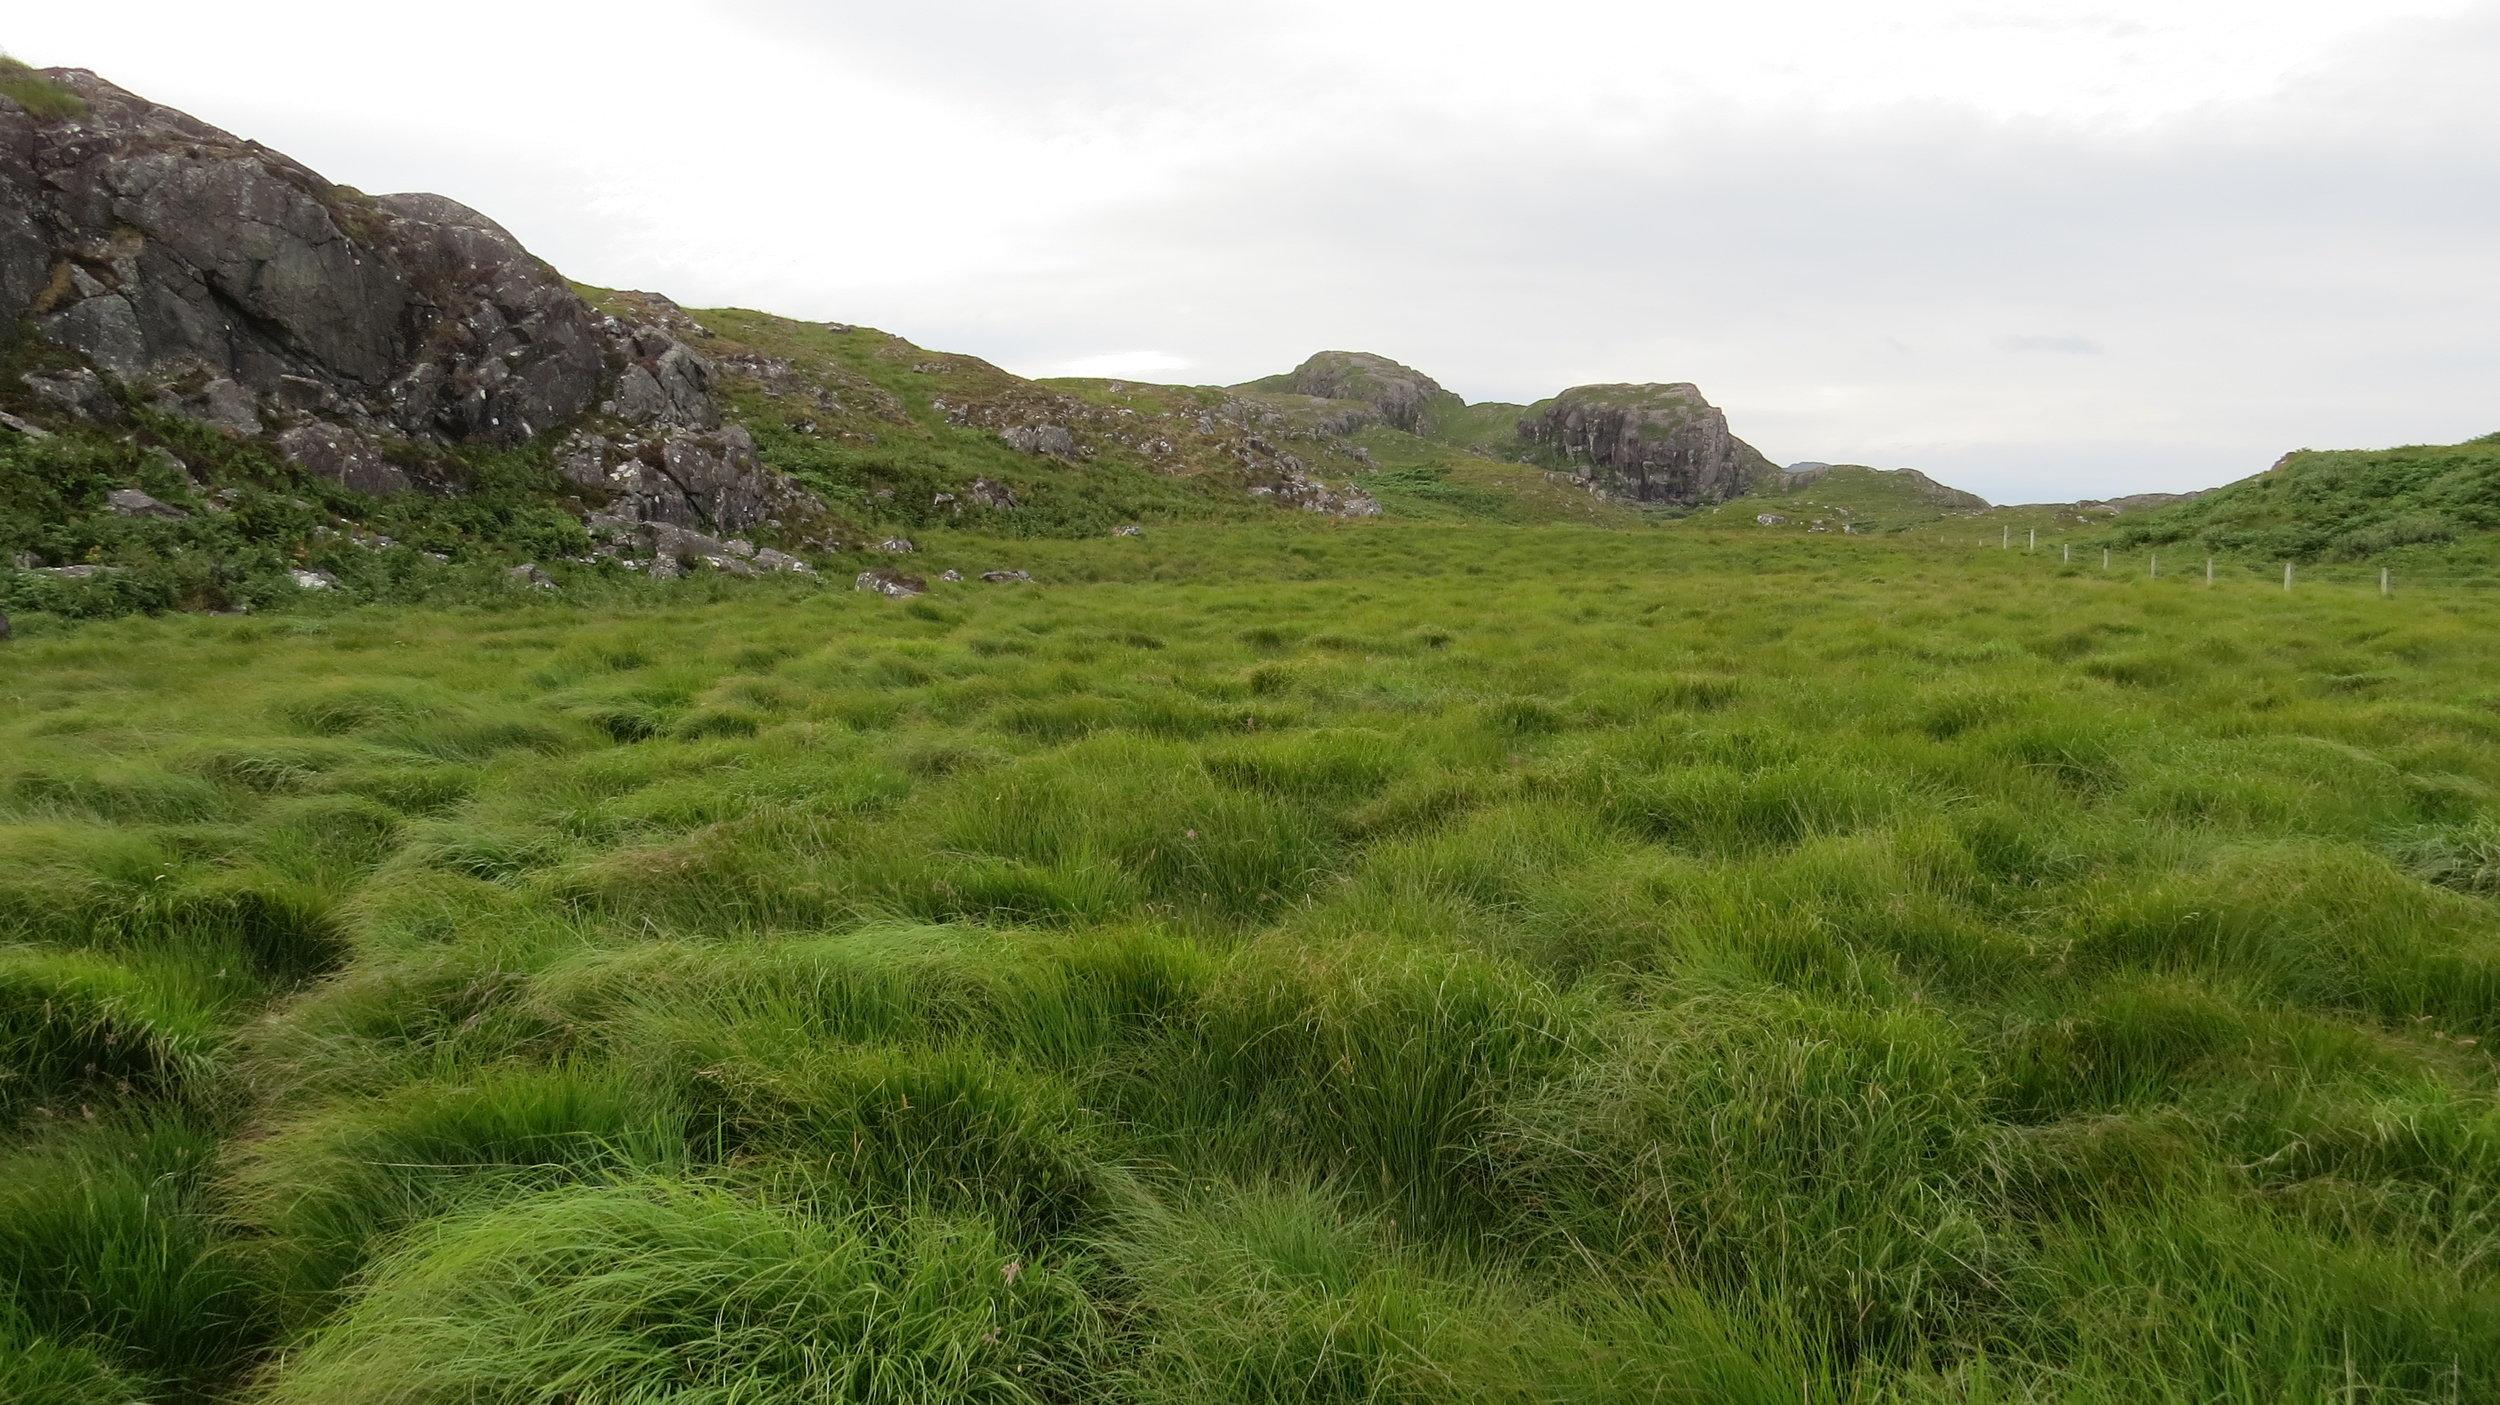 Lumpy Grass Walking